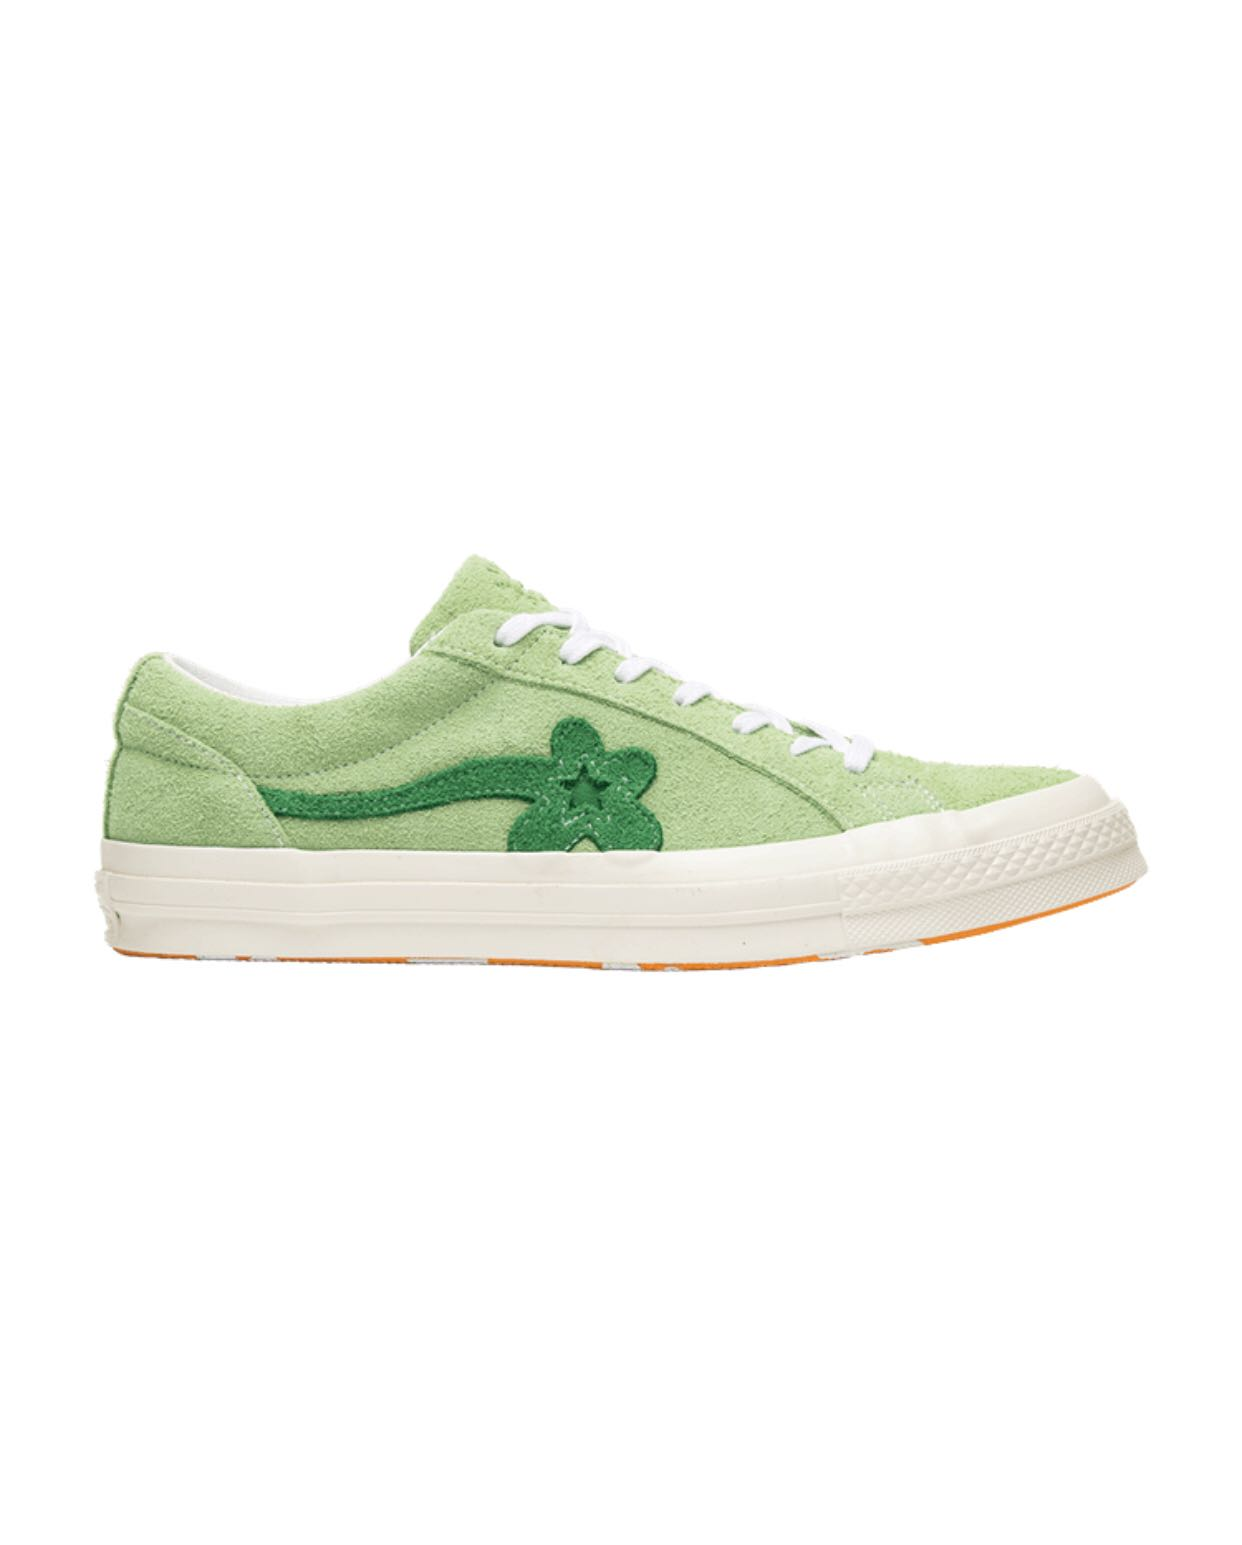 1ece9aad5dda Golf Le Fleur X One Star (Jade Lime)